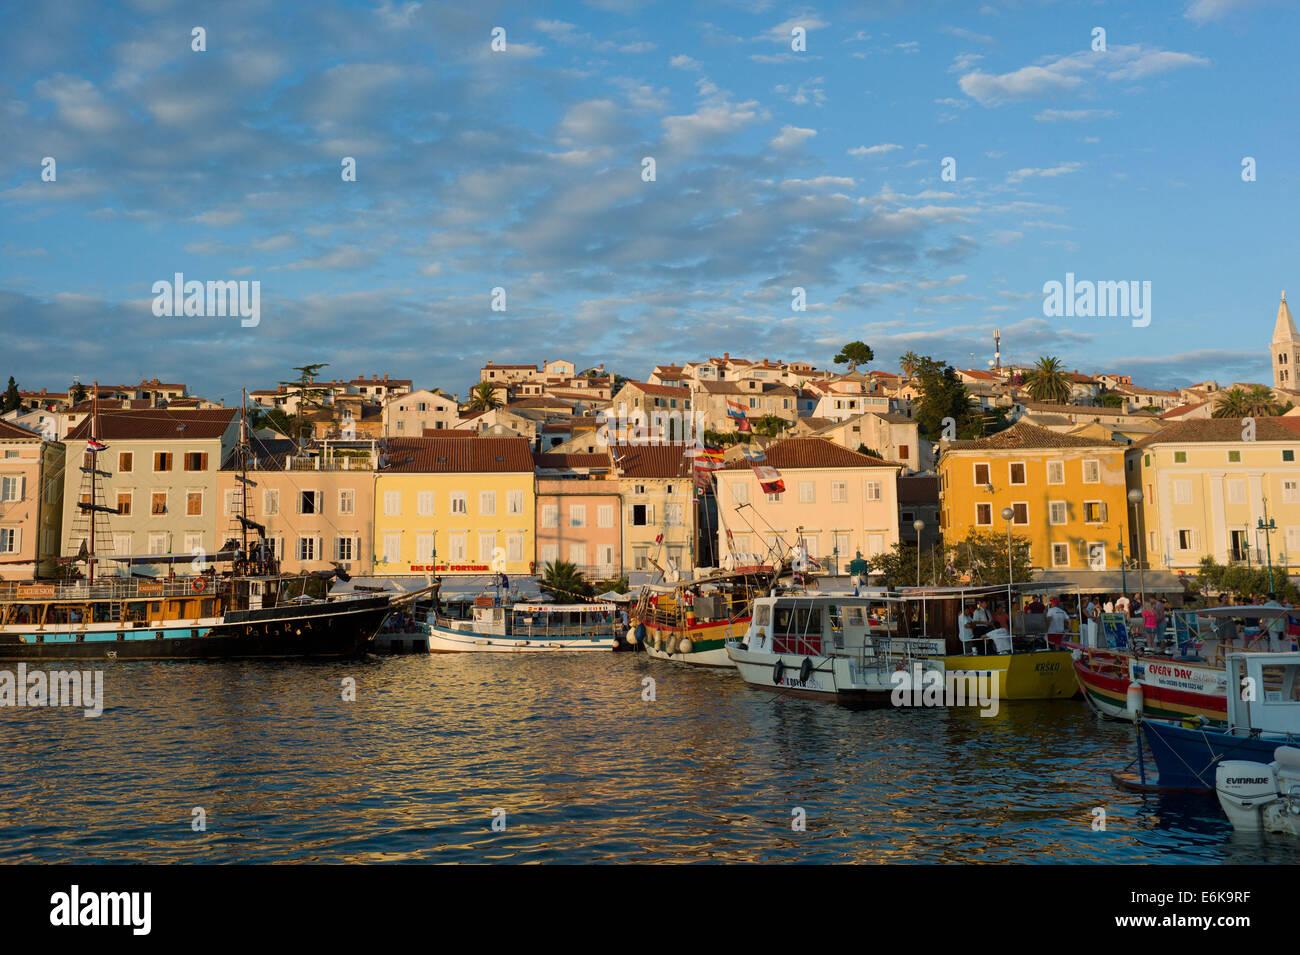 Boote in den Hafen von Mali Losinj, Insel Losinj, Kroatien Stockbild